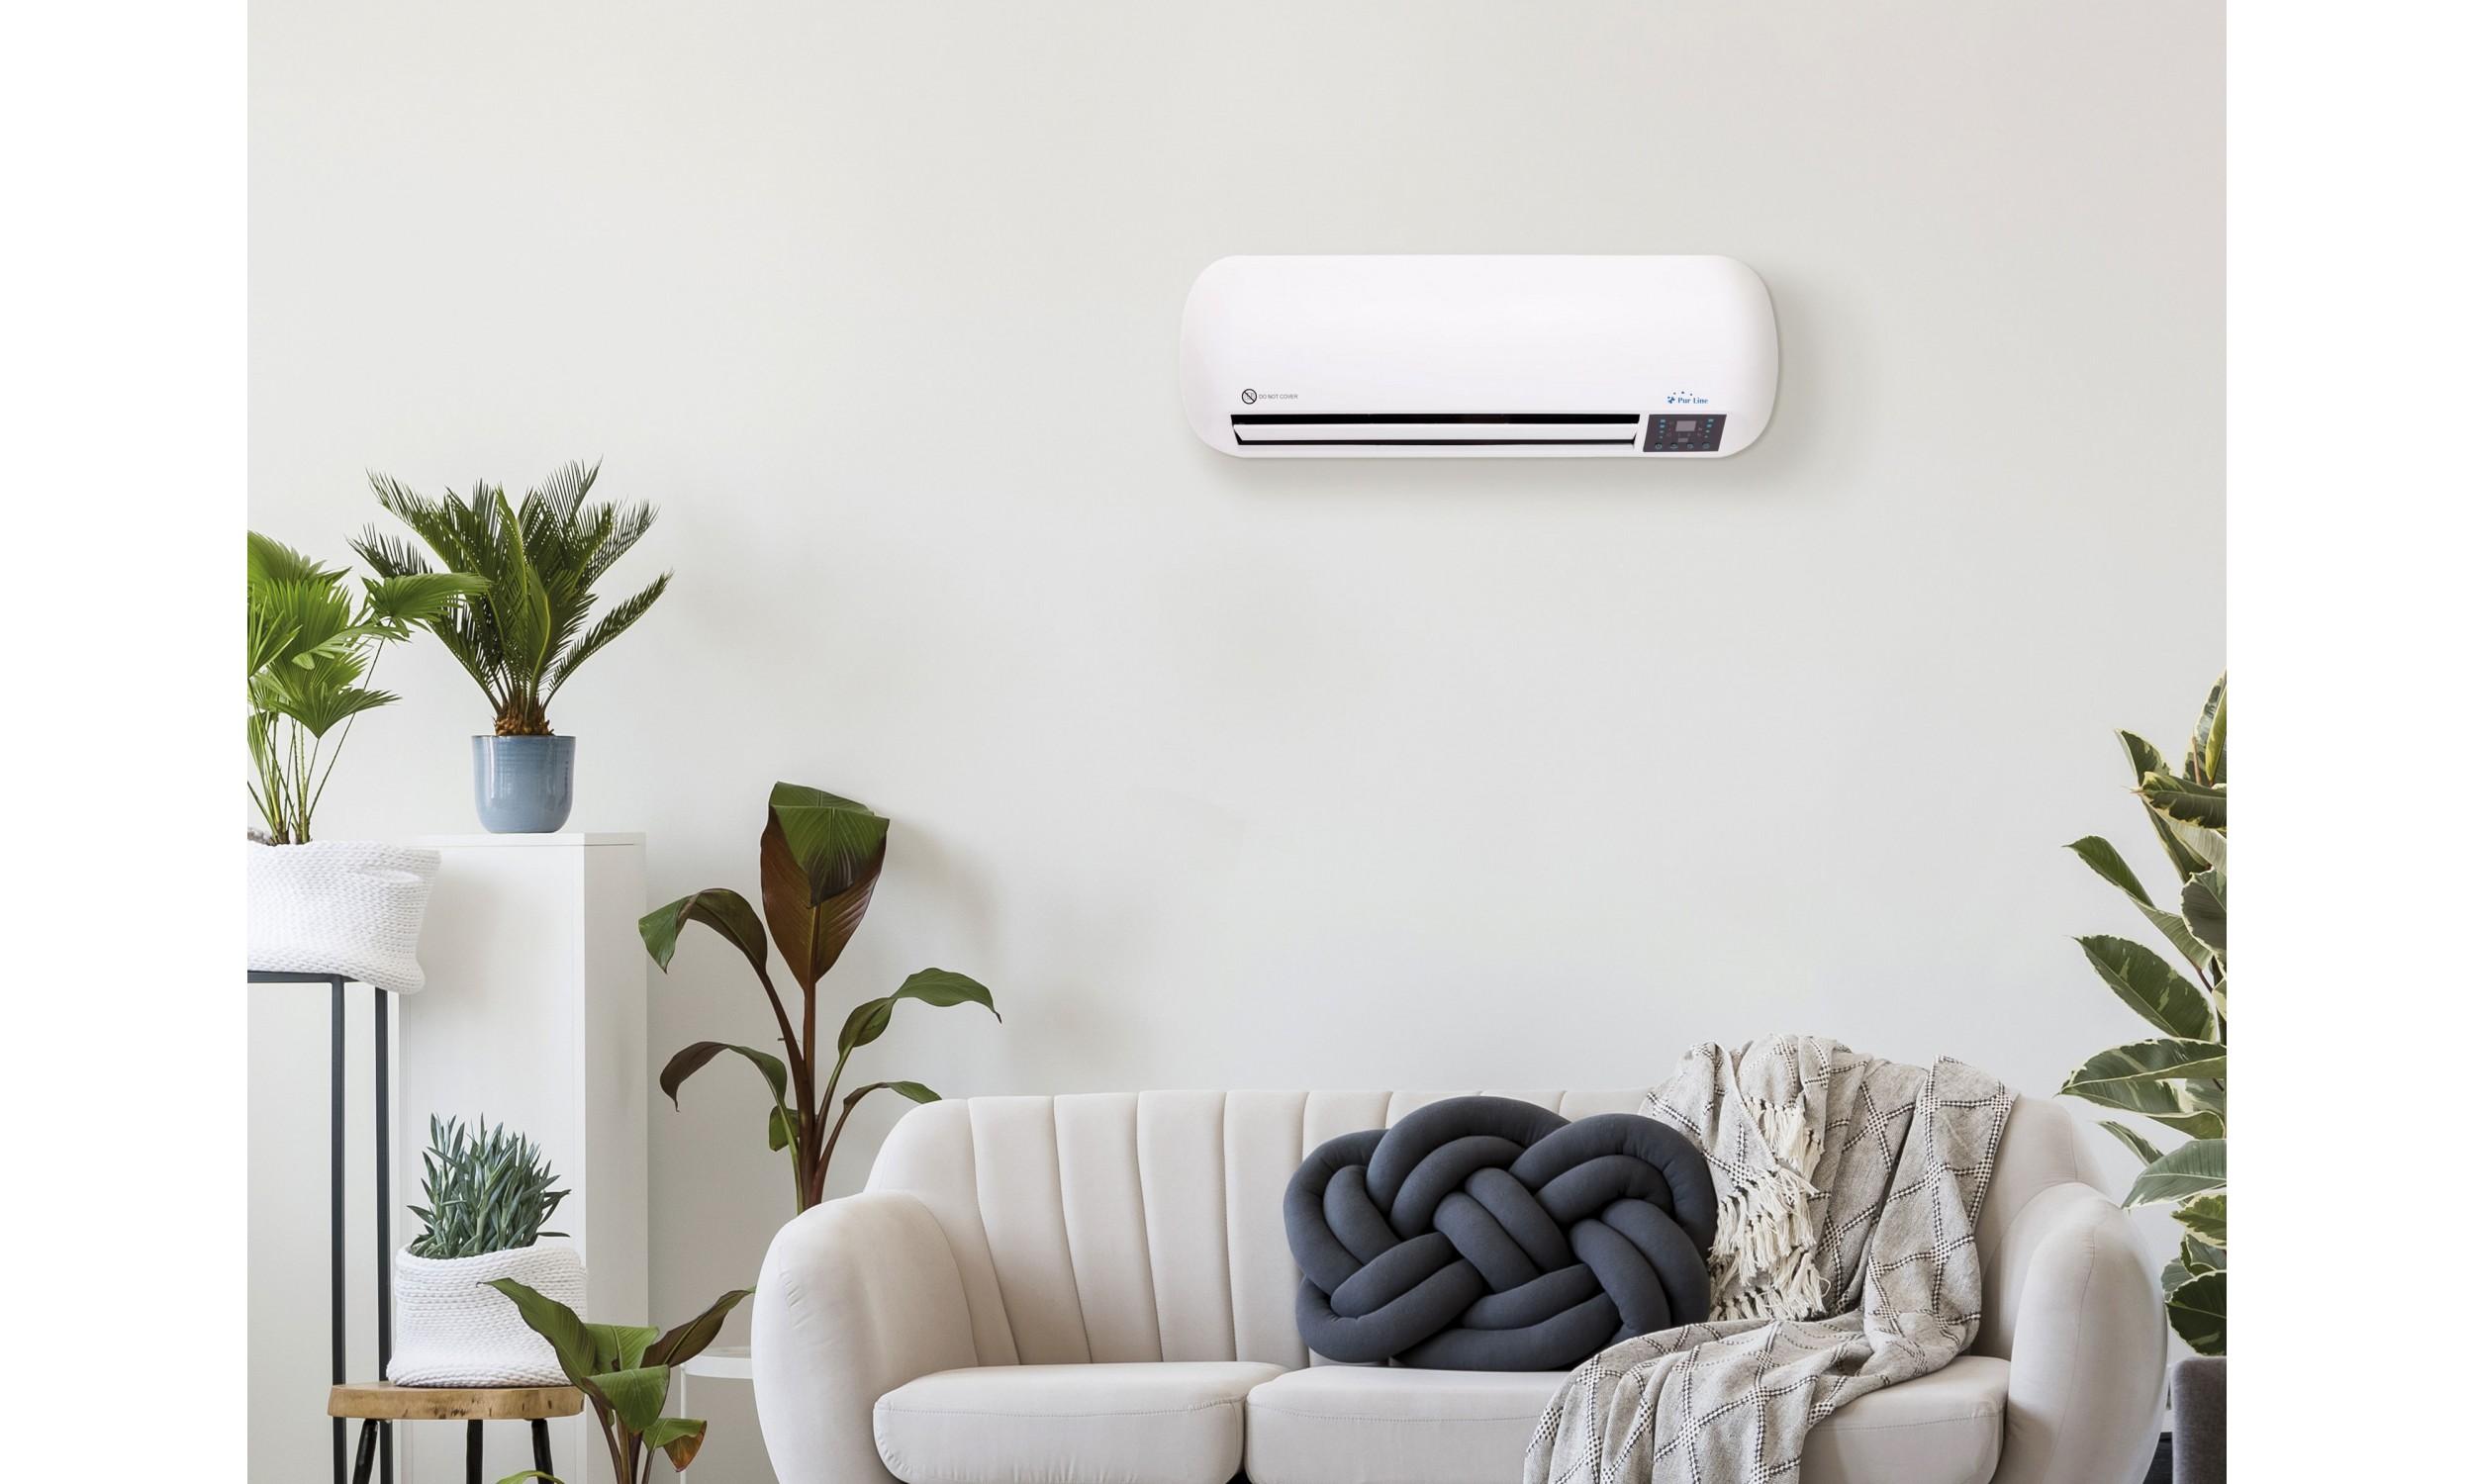 Ceramic electic wall heating HOTI M70